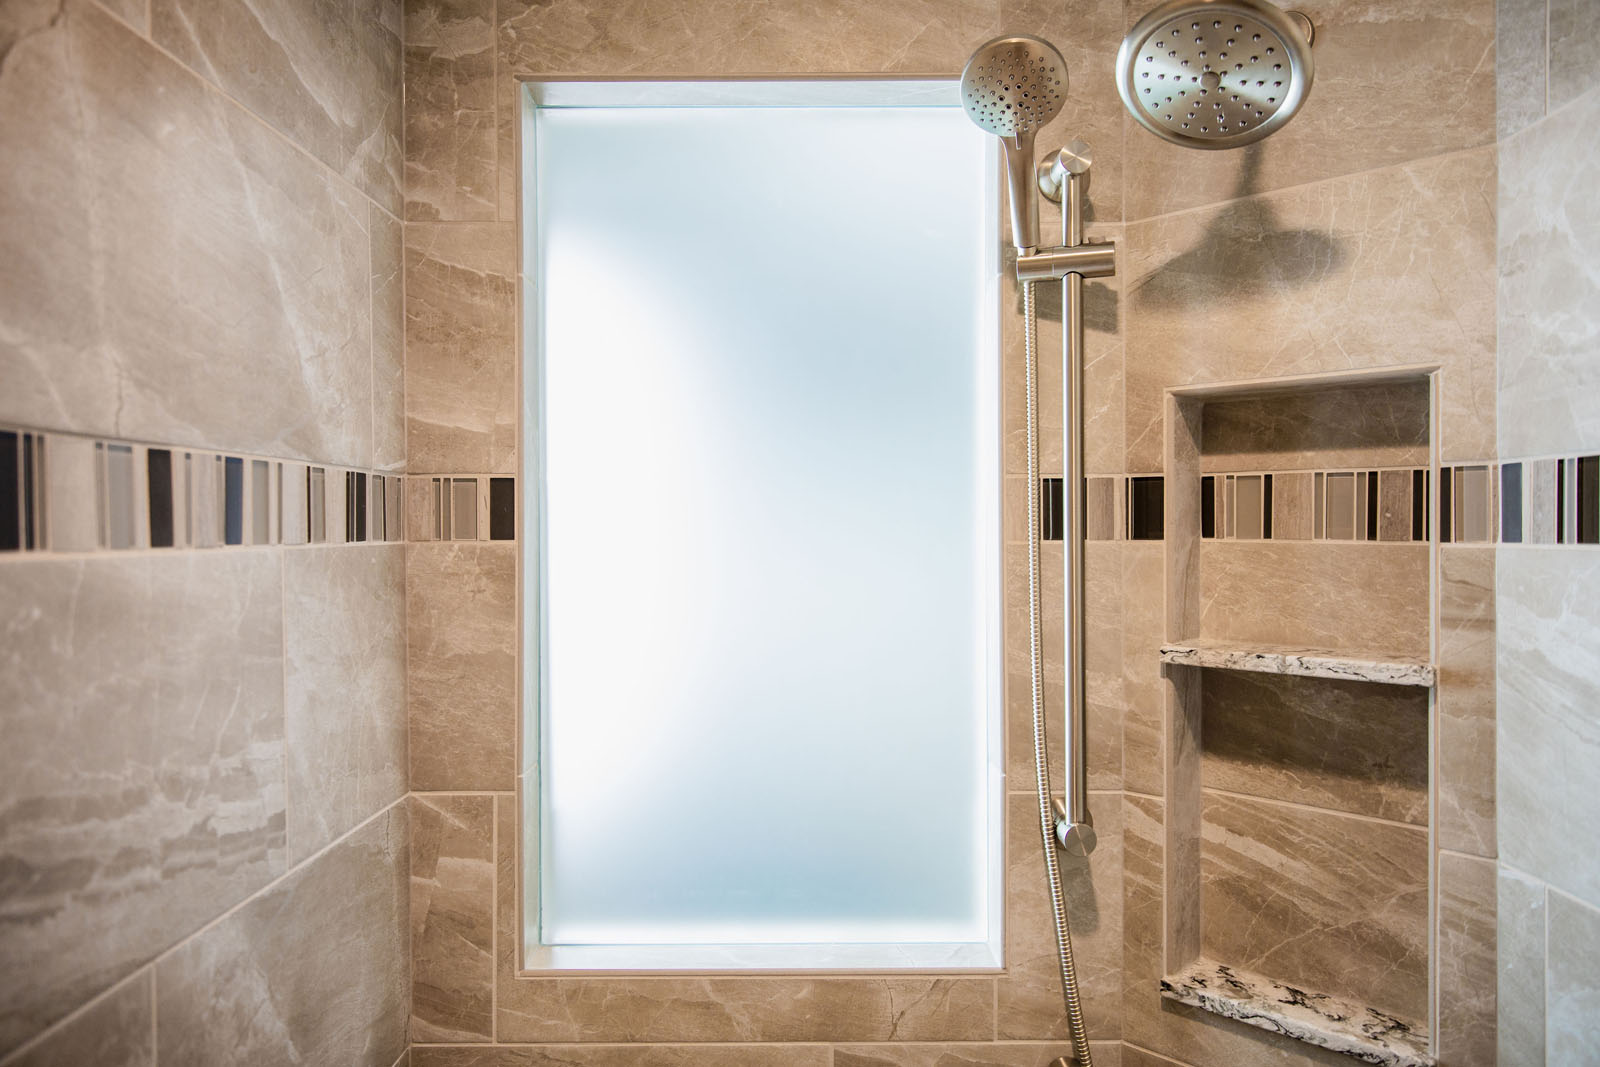 Elias Construction Master Suites and Bathrooms